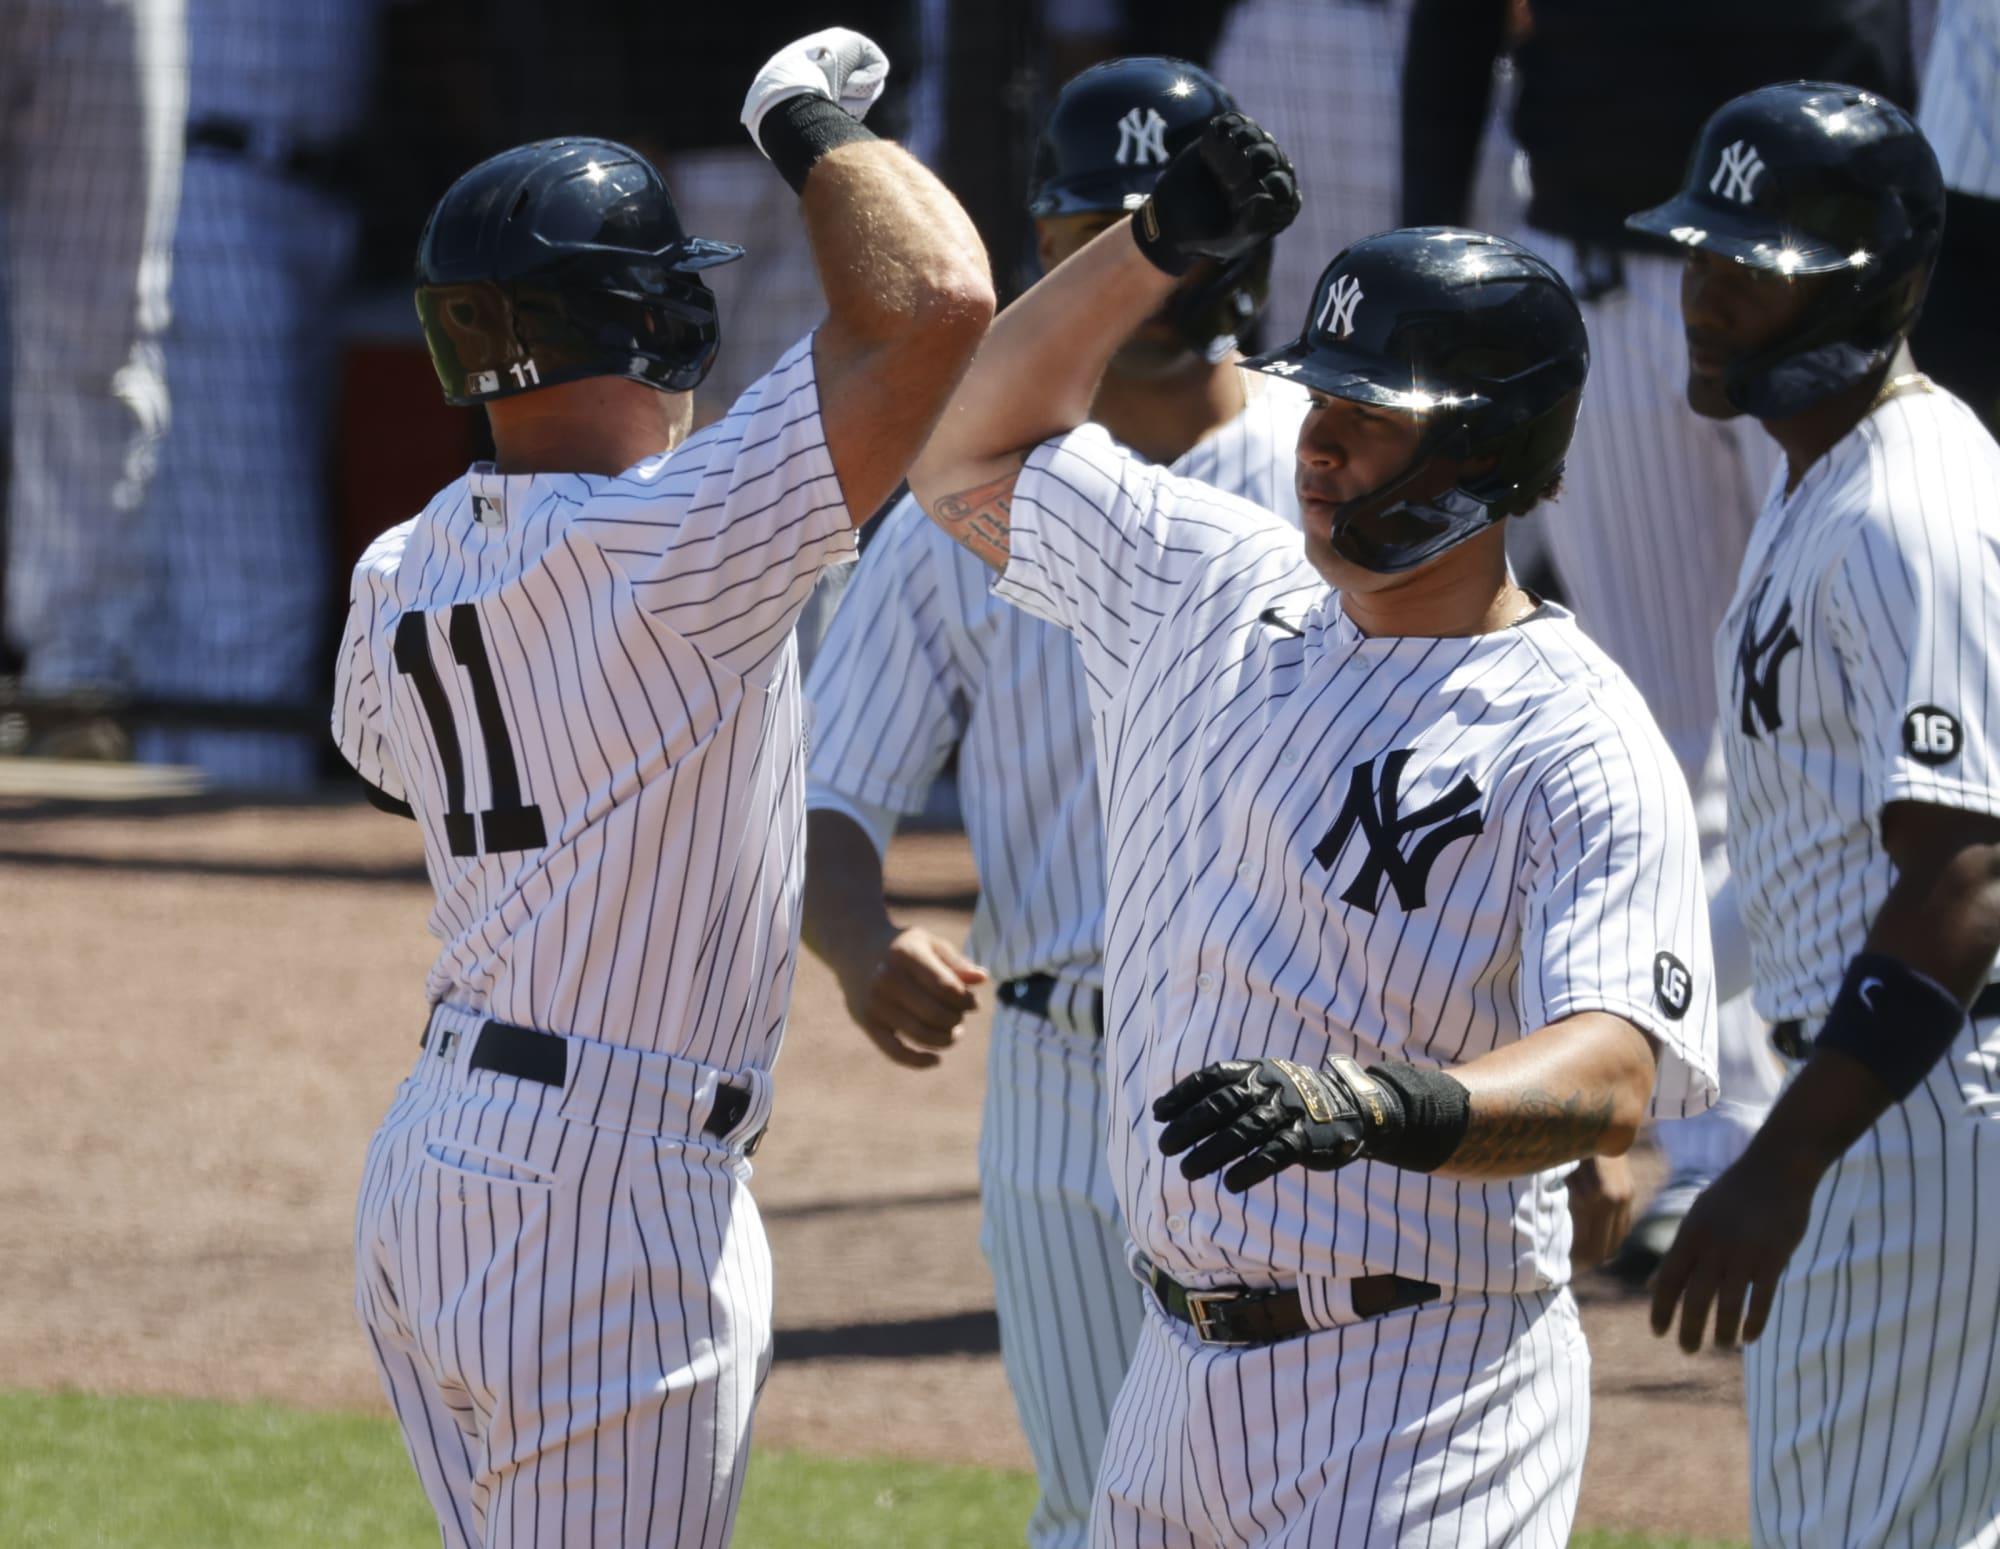 Yankees: Aaron Judge kickstarts Gary Sanchez MVP buzz